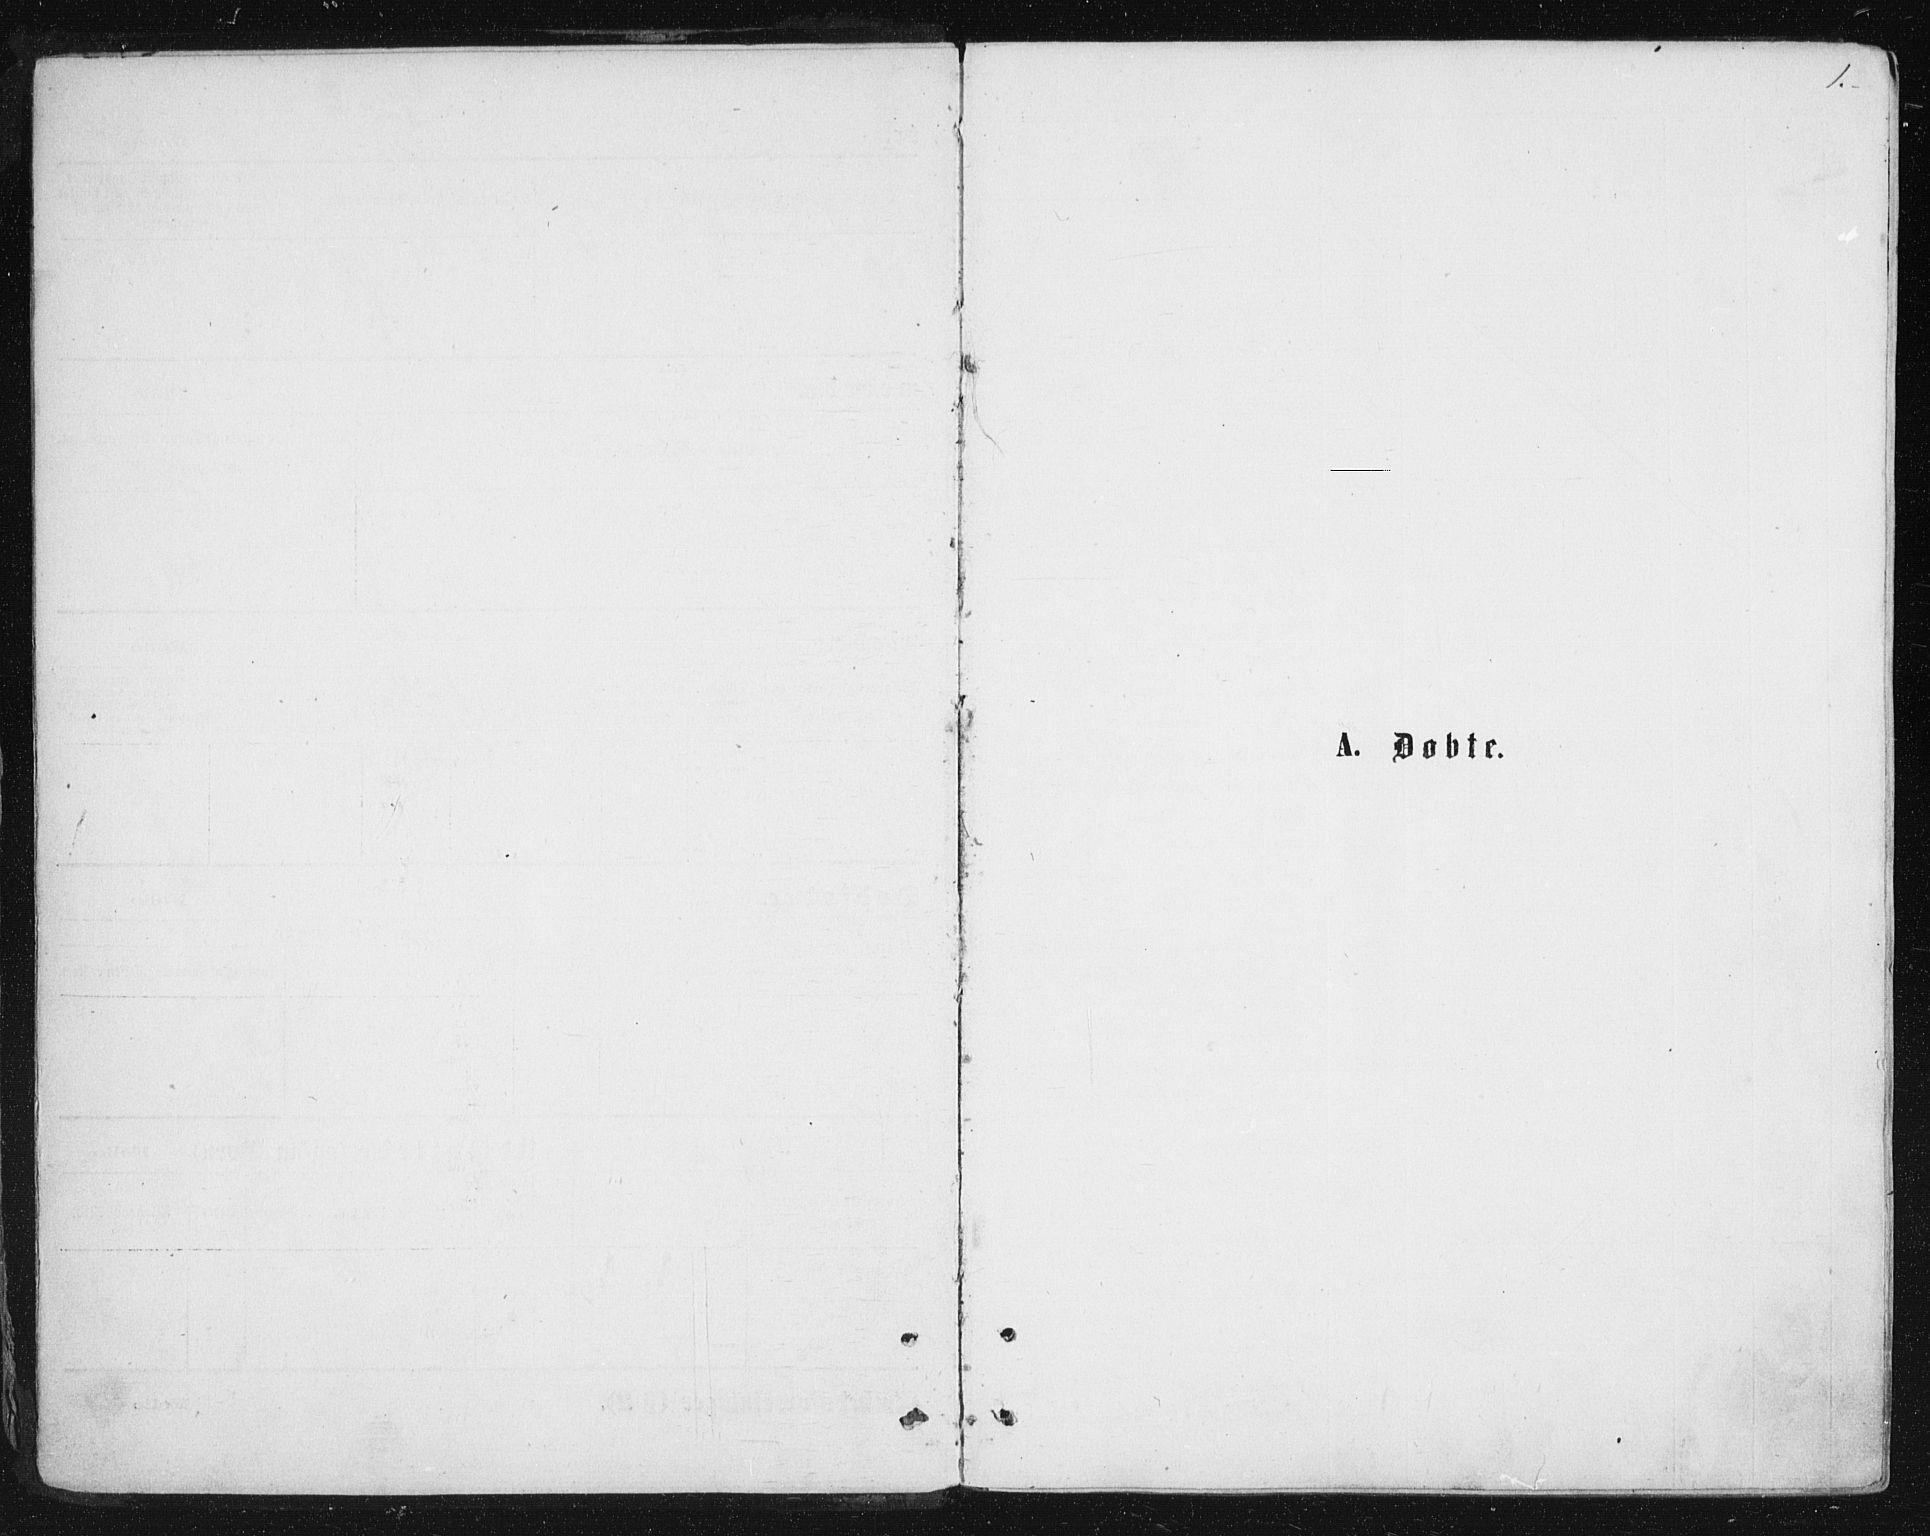 SAT, Ministerialprotokoller, klokkerbøker og fødselsregistre - Nordland, 888/L1243: Ministerialbok nr. 888A09, 1876-1879, s. 1